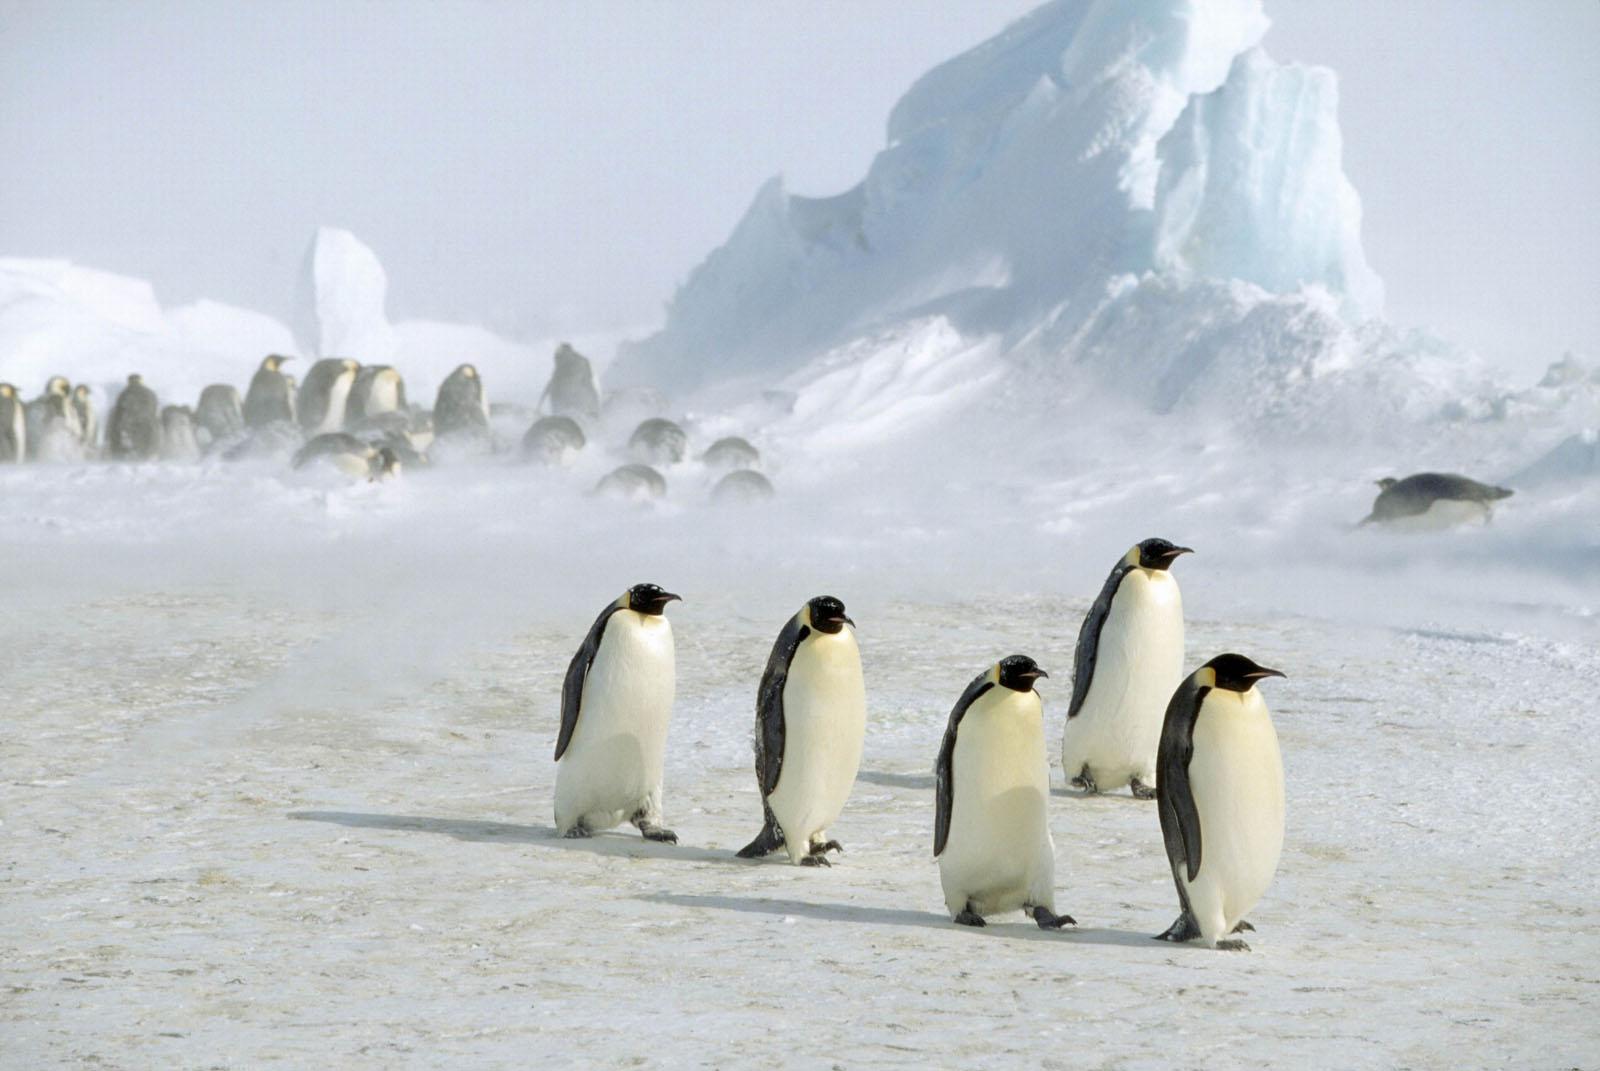 http://phototry.narod.ru/images/animals/animal9_20070601_1637416995.jpg